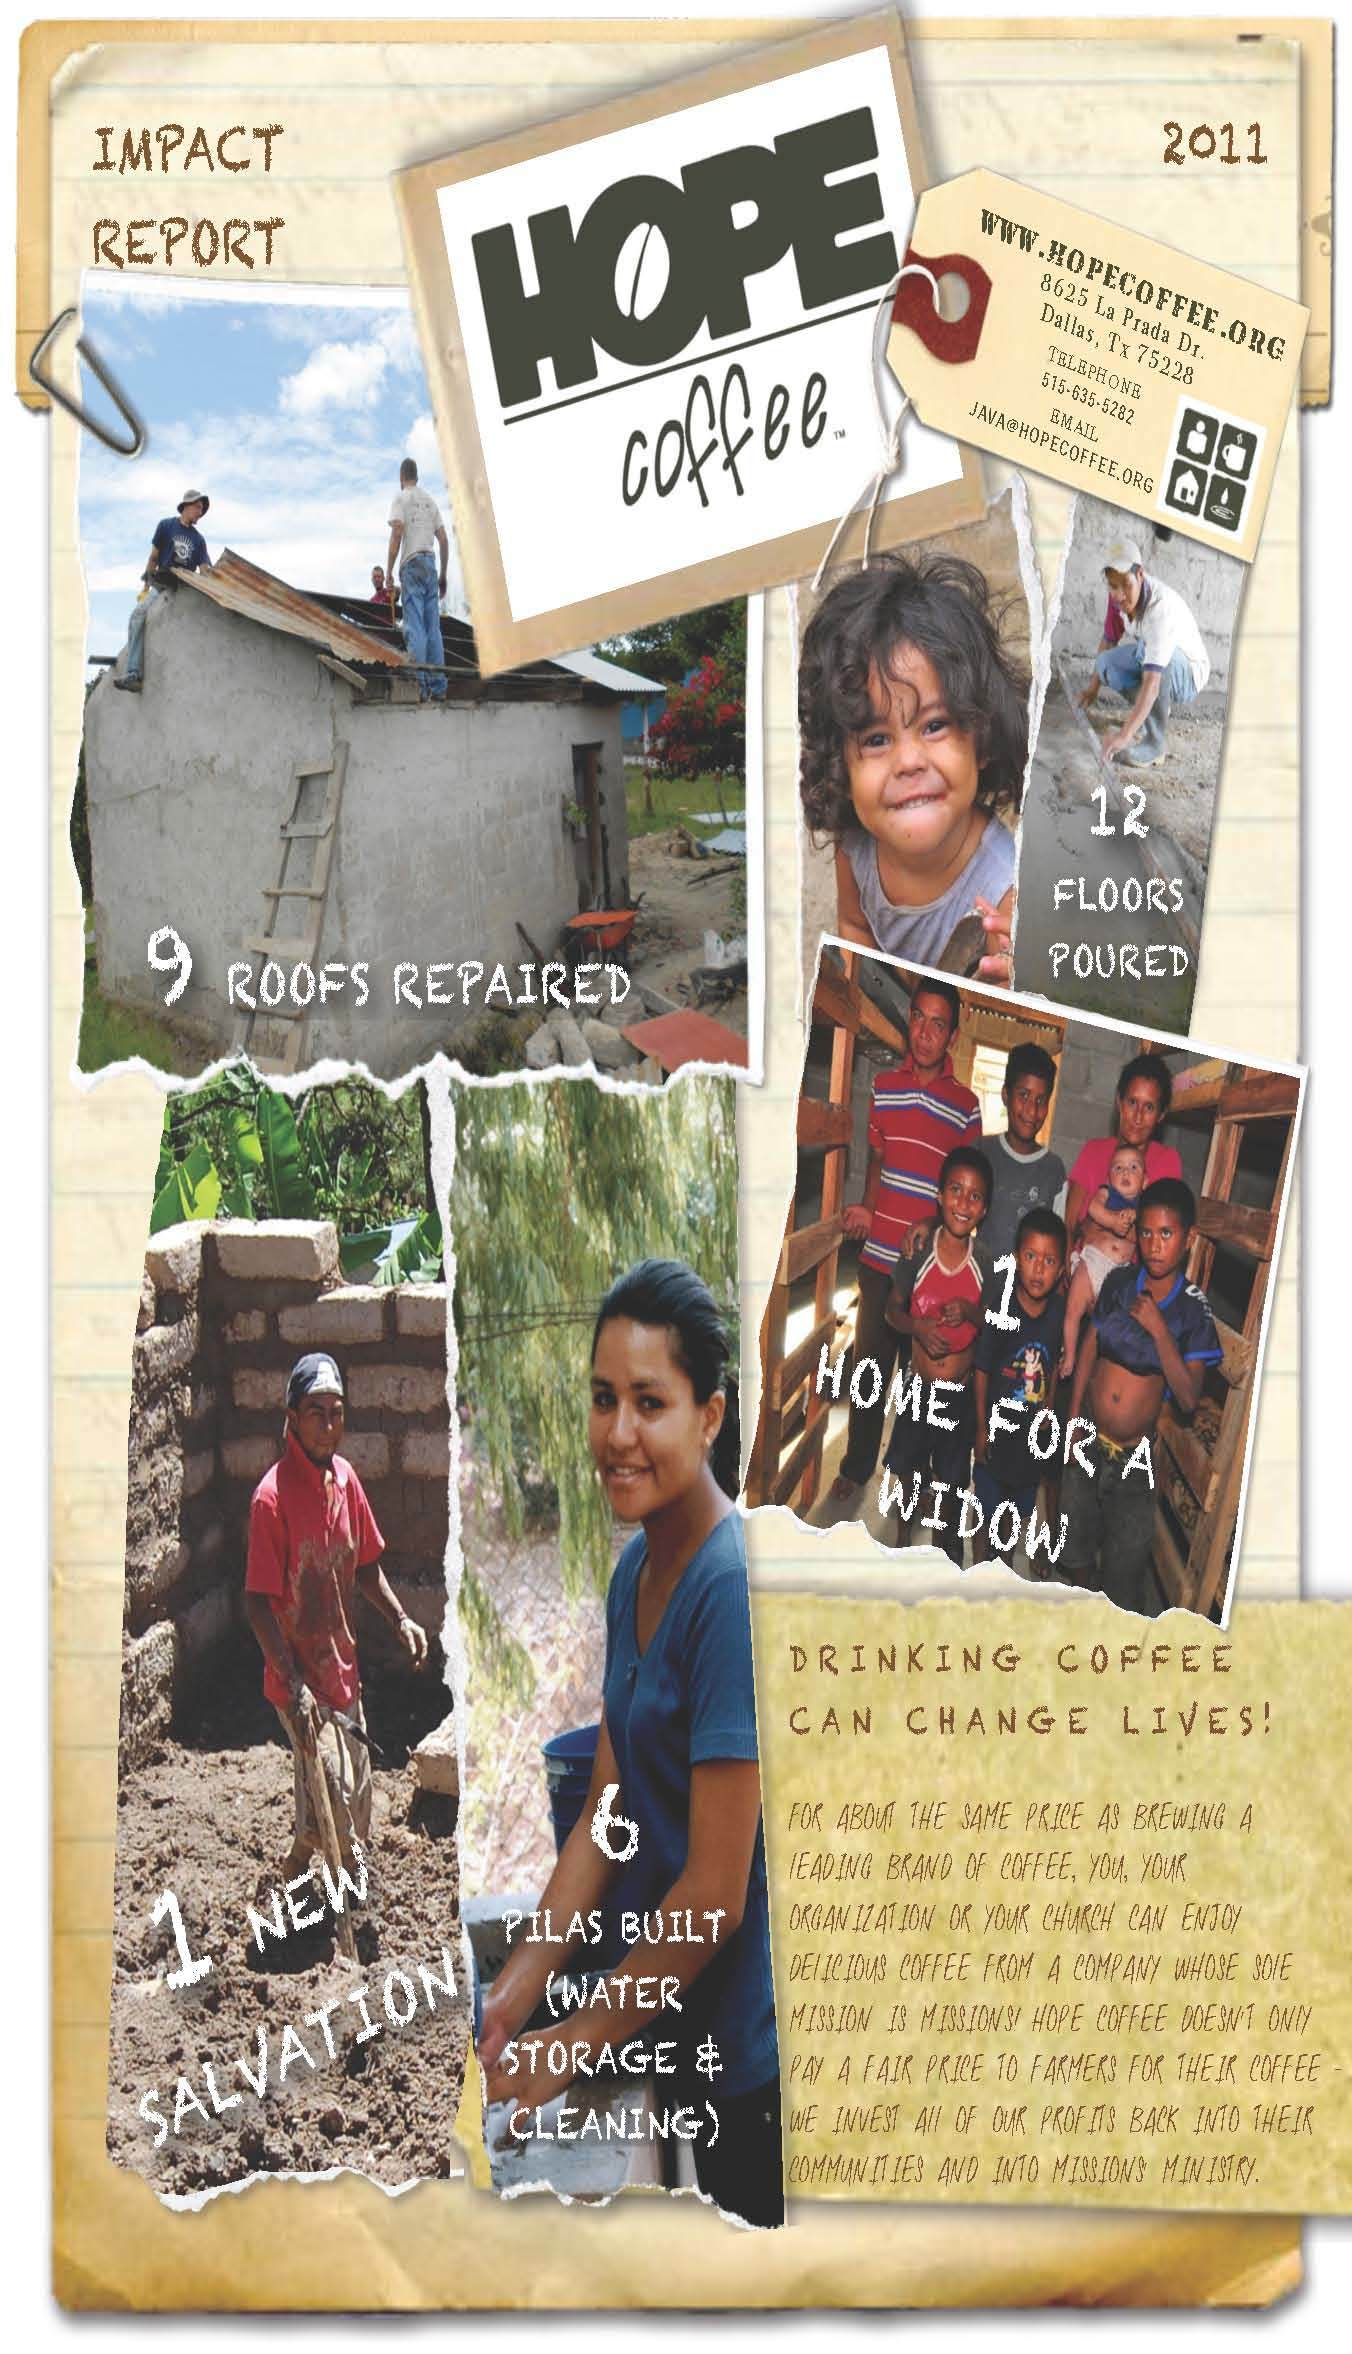 2011 Impact Report